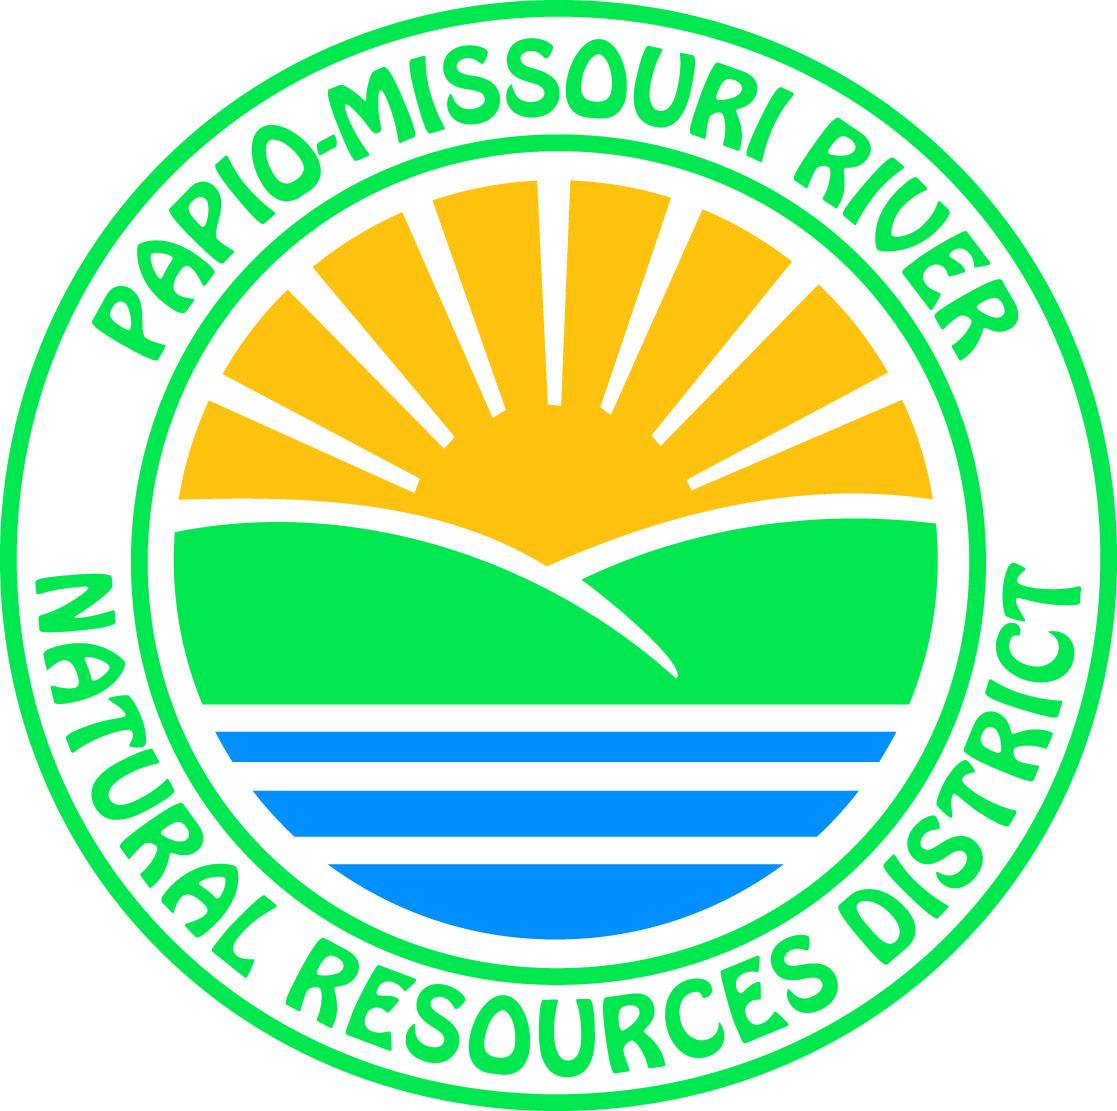 Papio-Missouri River NRD